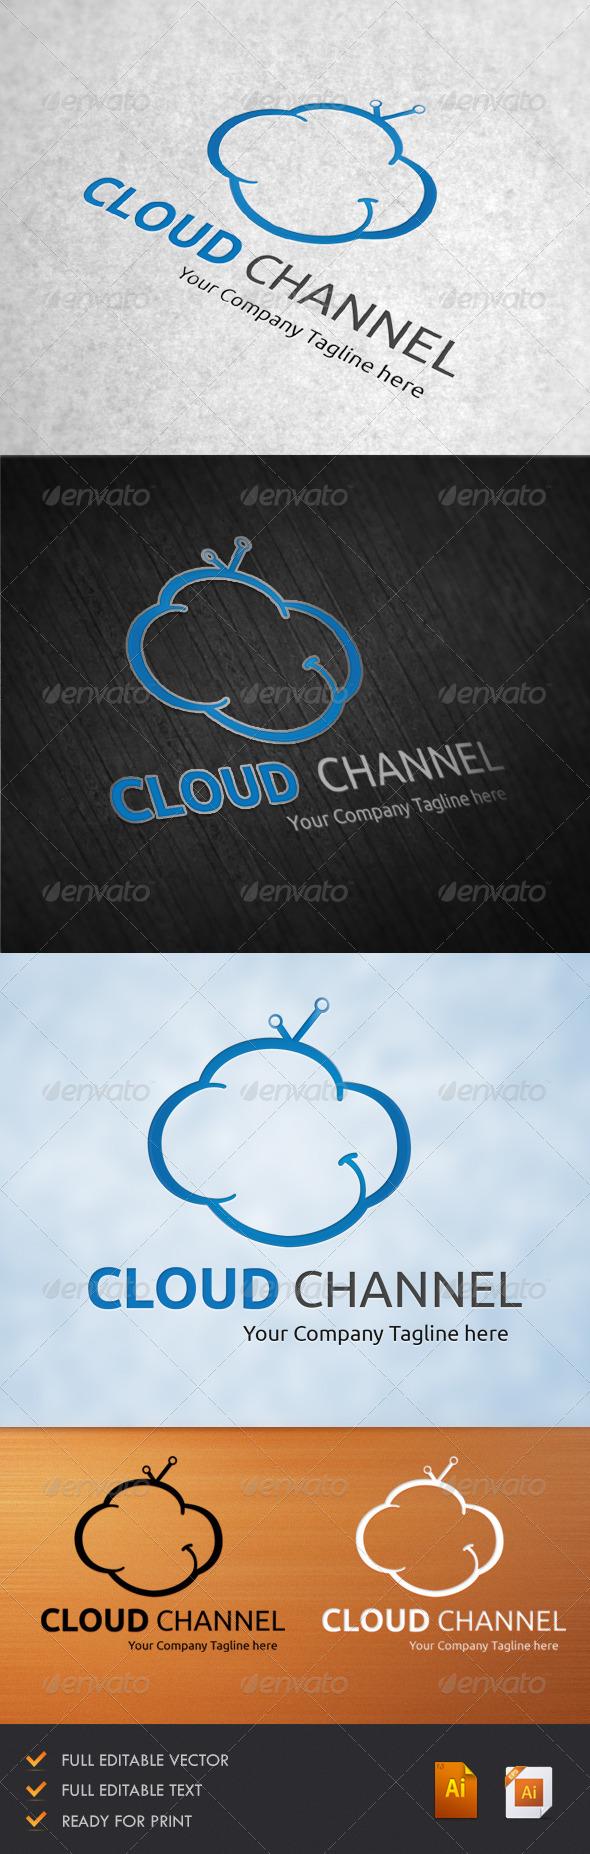 GraphicRiver Cloud Channel Logo 5134108